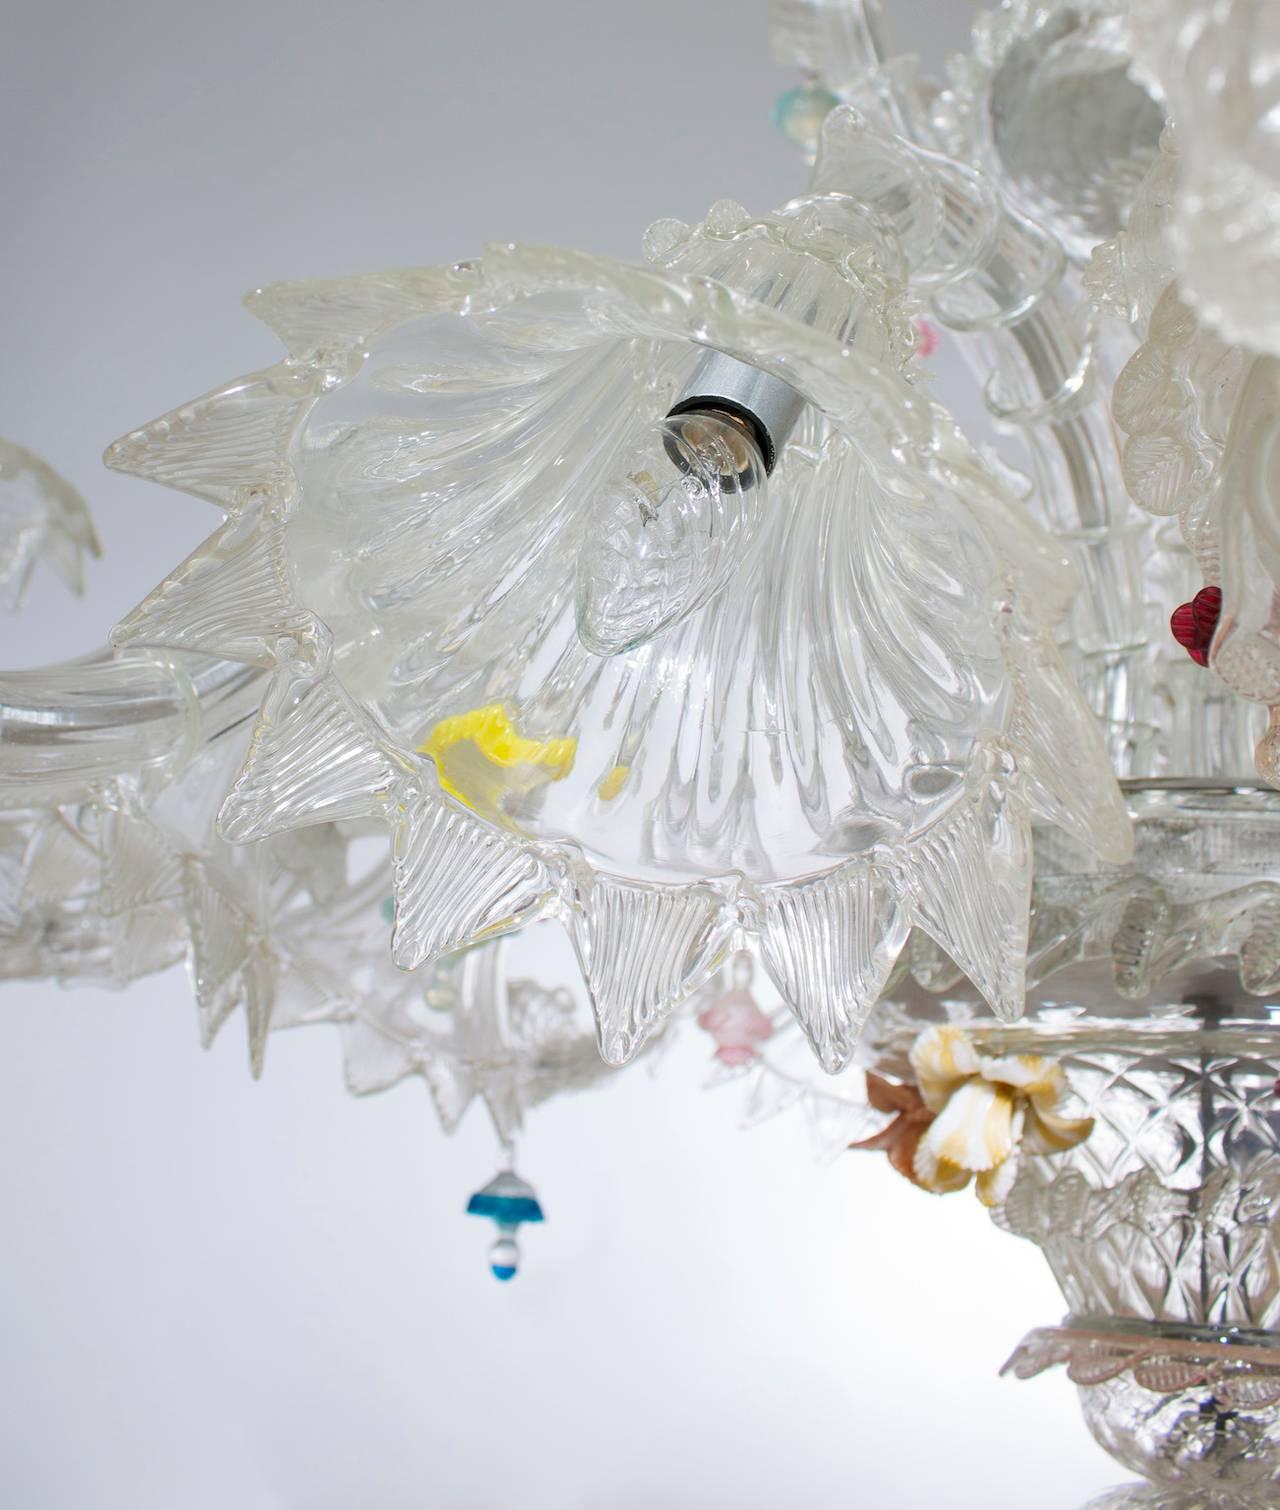 Italian Venetian Ca'rezzonico Chandelier, Blown Murano Glass, Seguso, 1950s For Sale 2